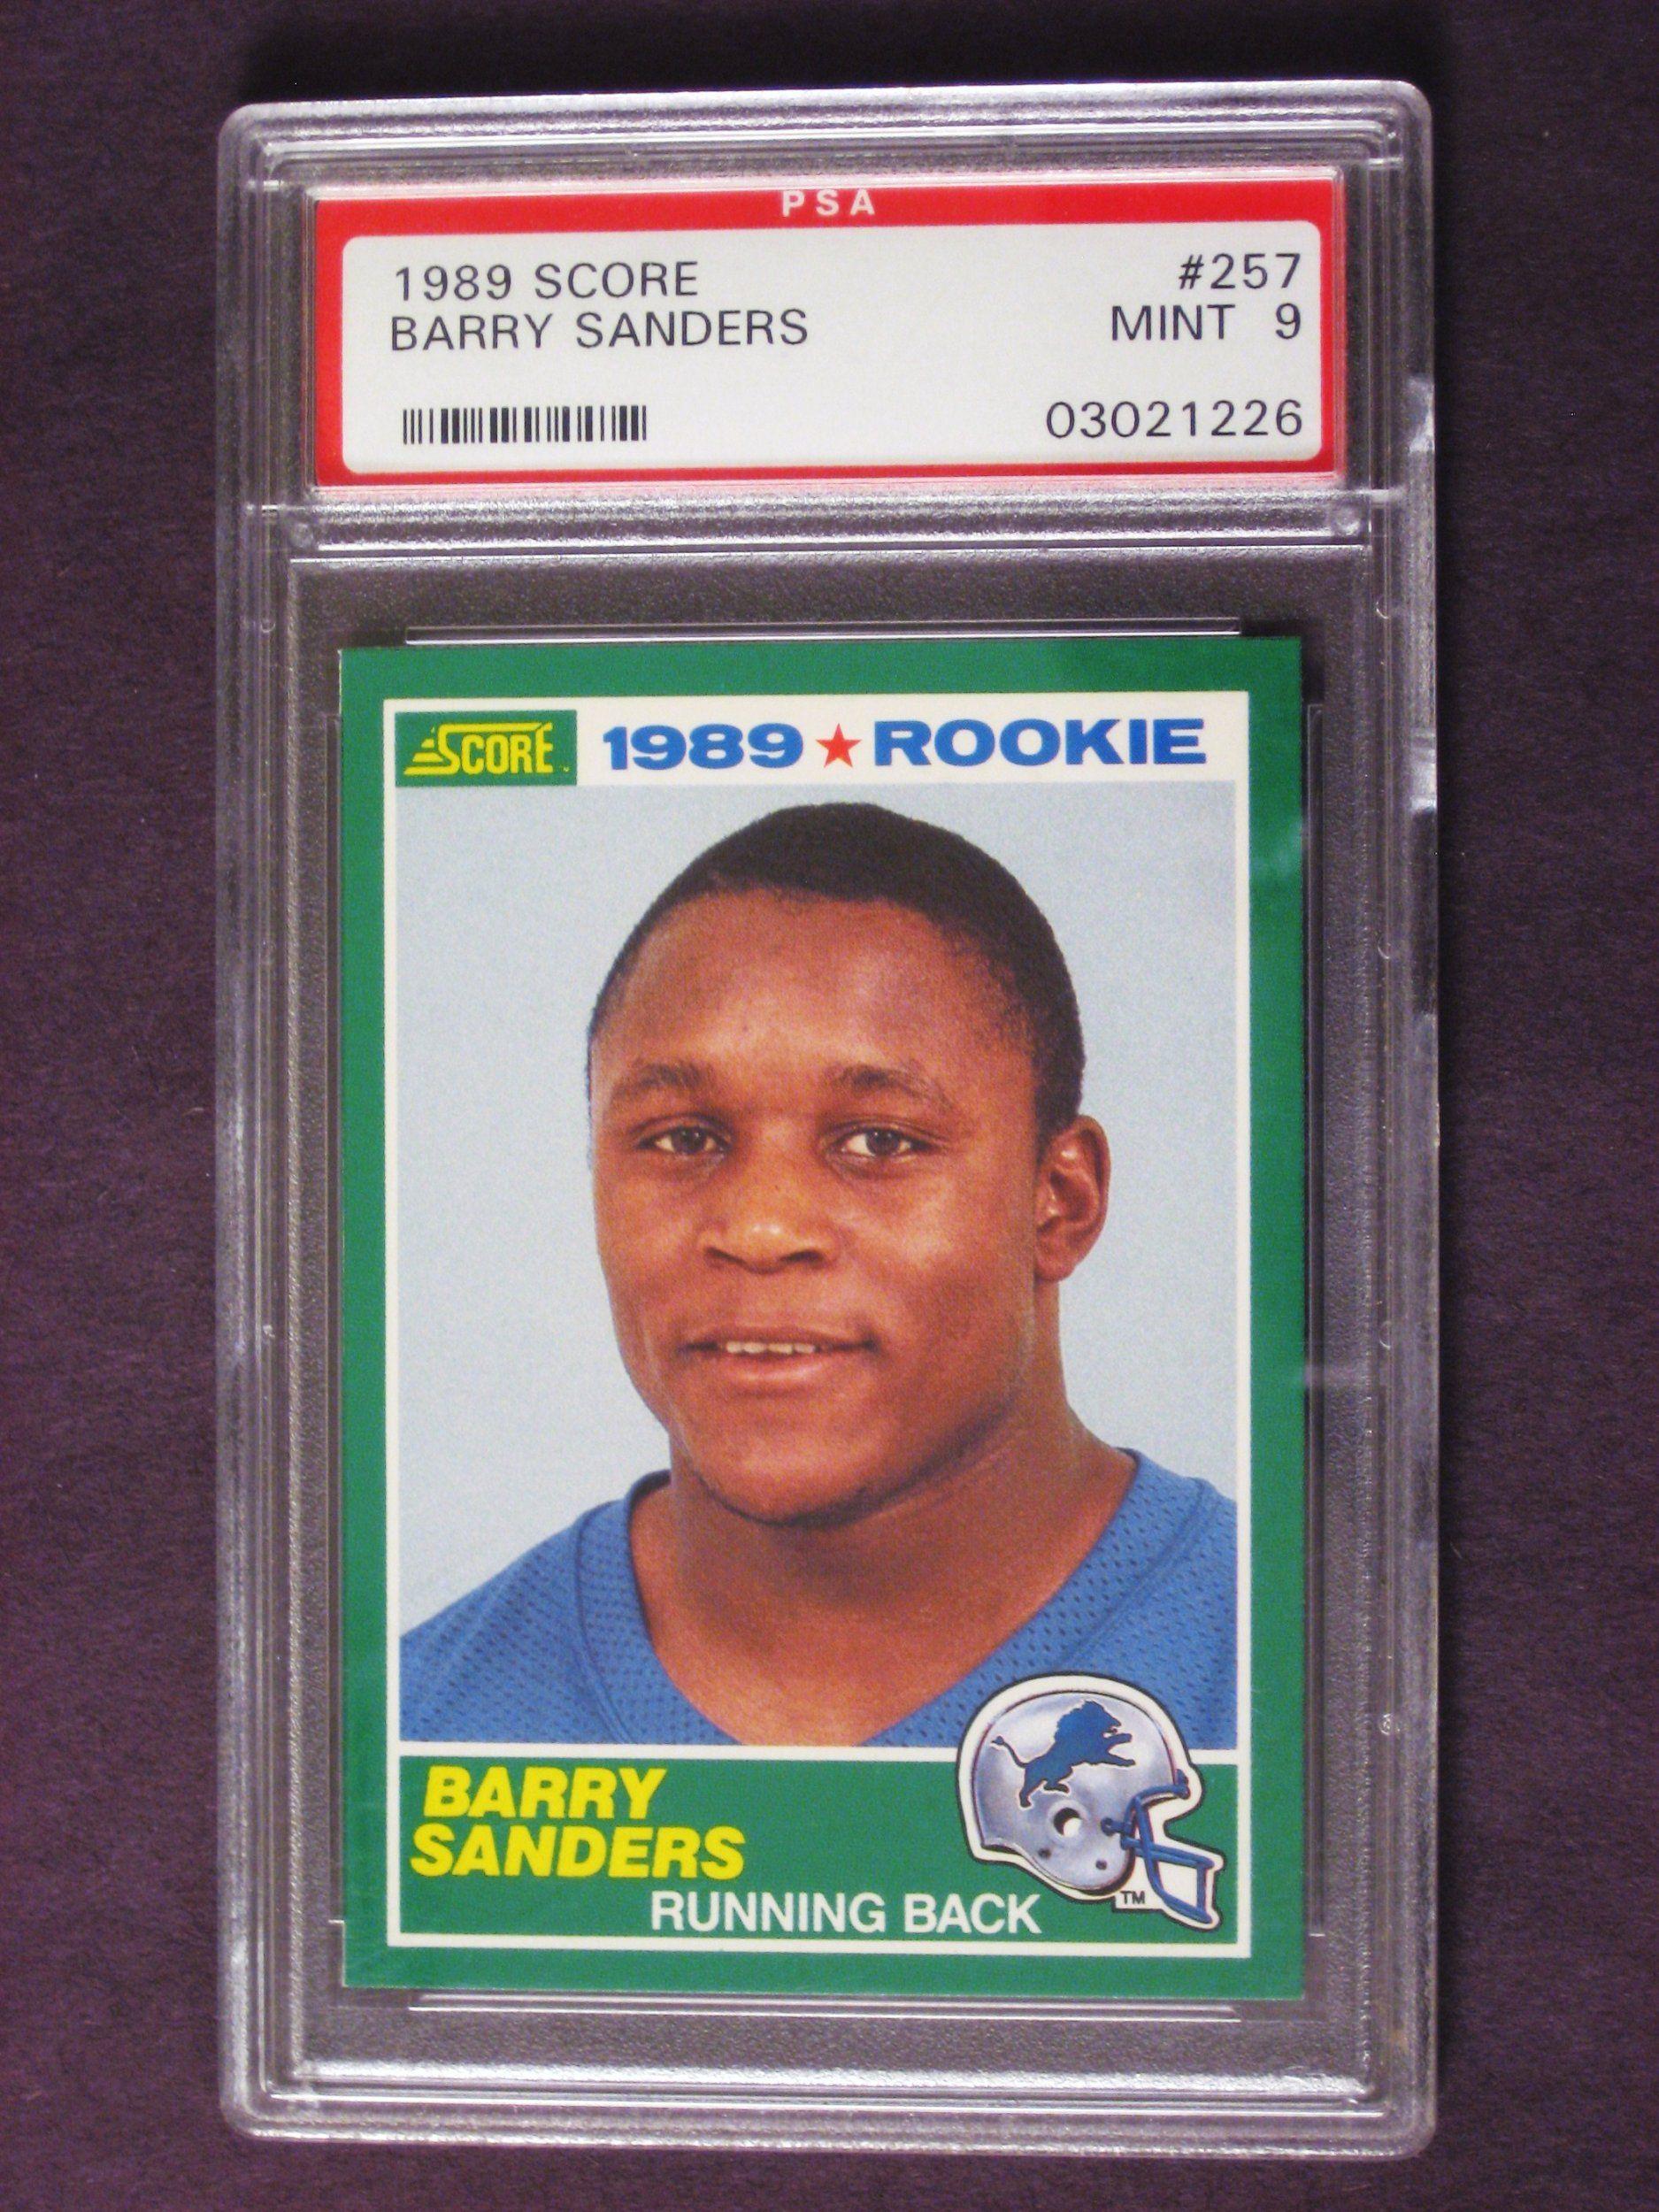 1989 Score Football Barry Sanders Rc Rookie Card 257 Psa Mint 9